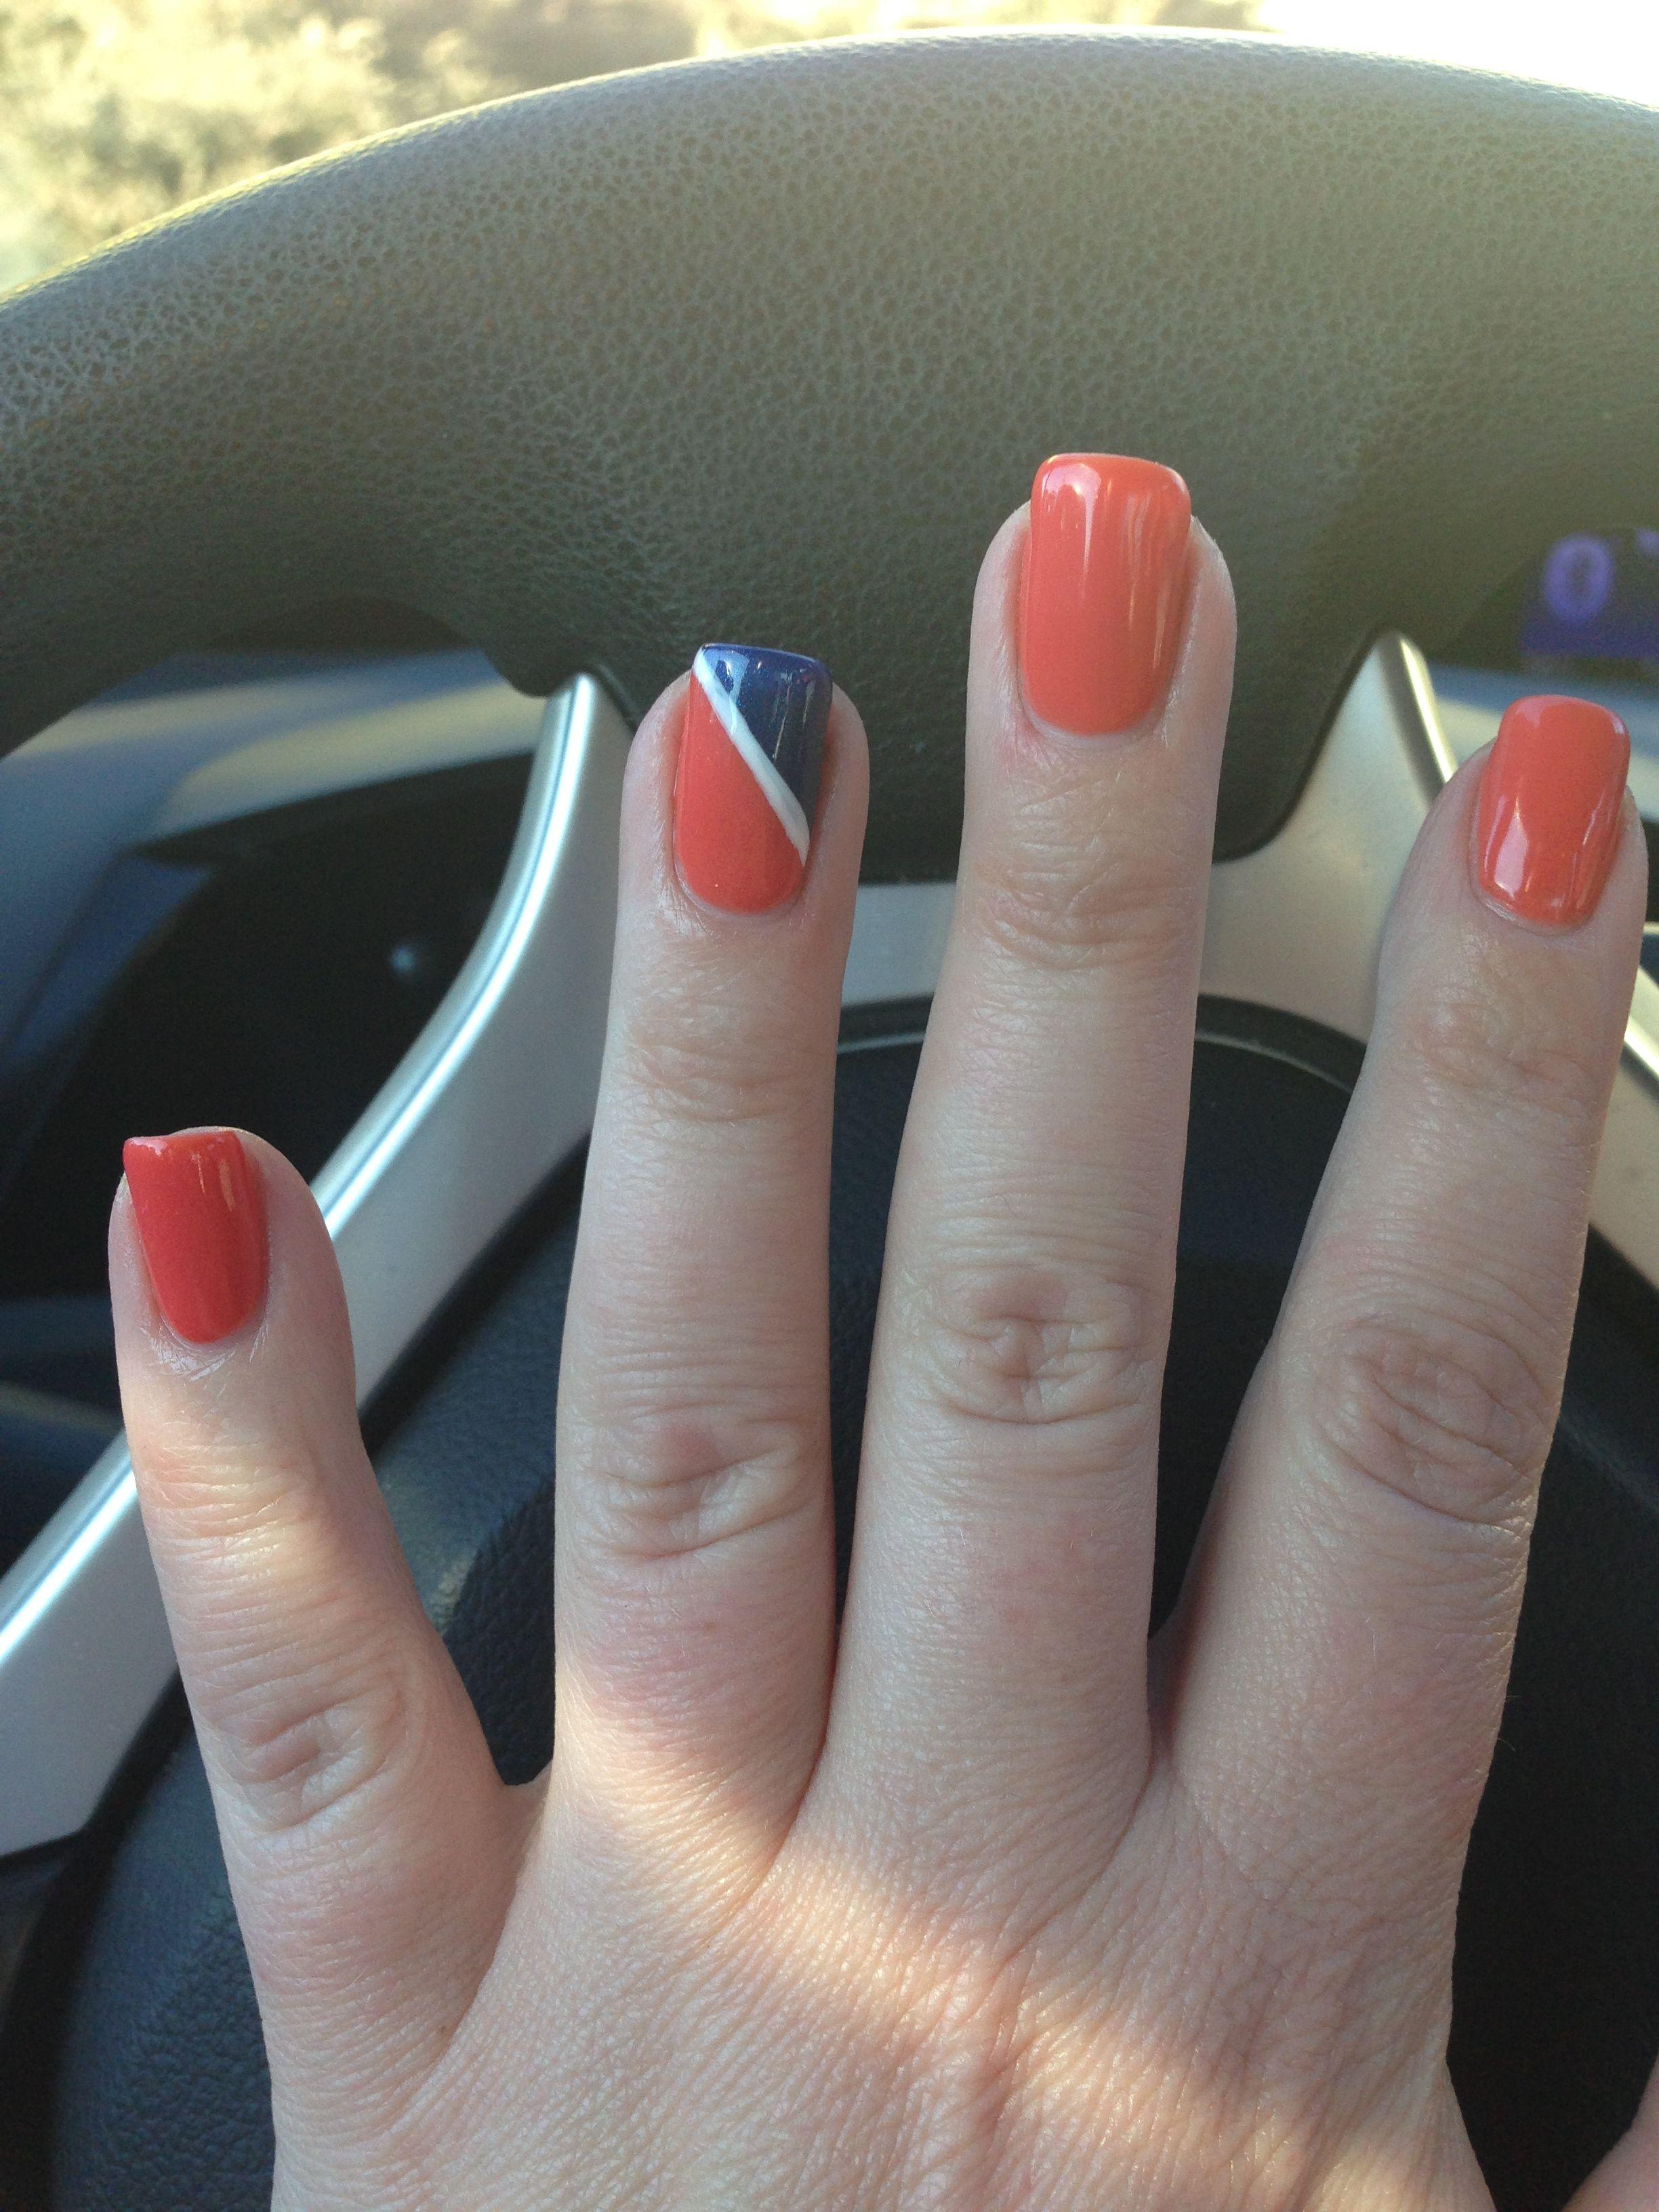 Denver Bronco Shellac Manicure | Nails | Pinterest | Shellac ...